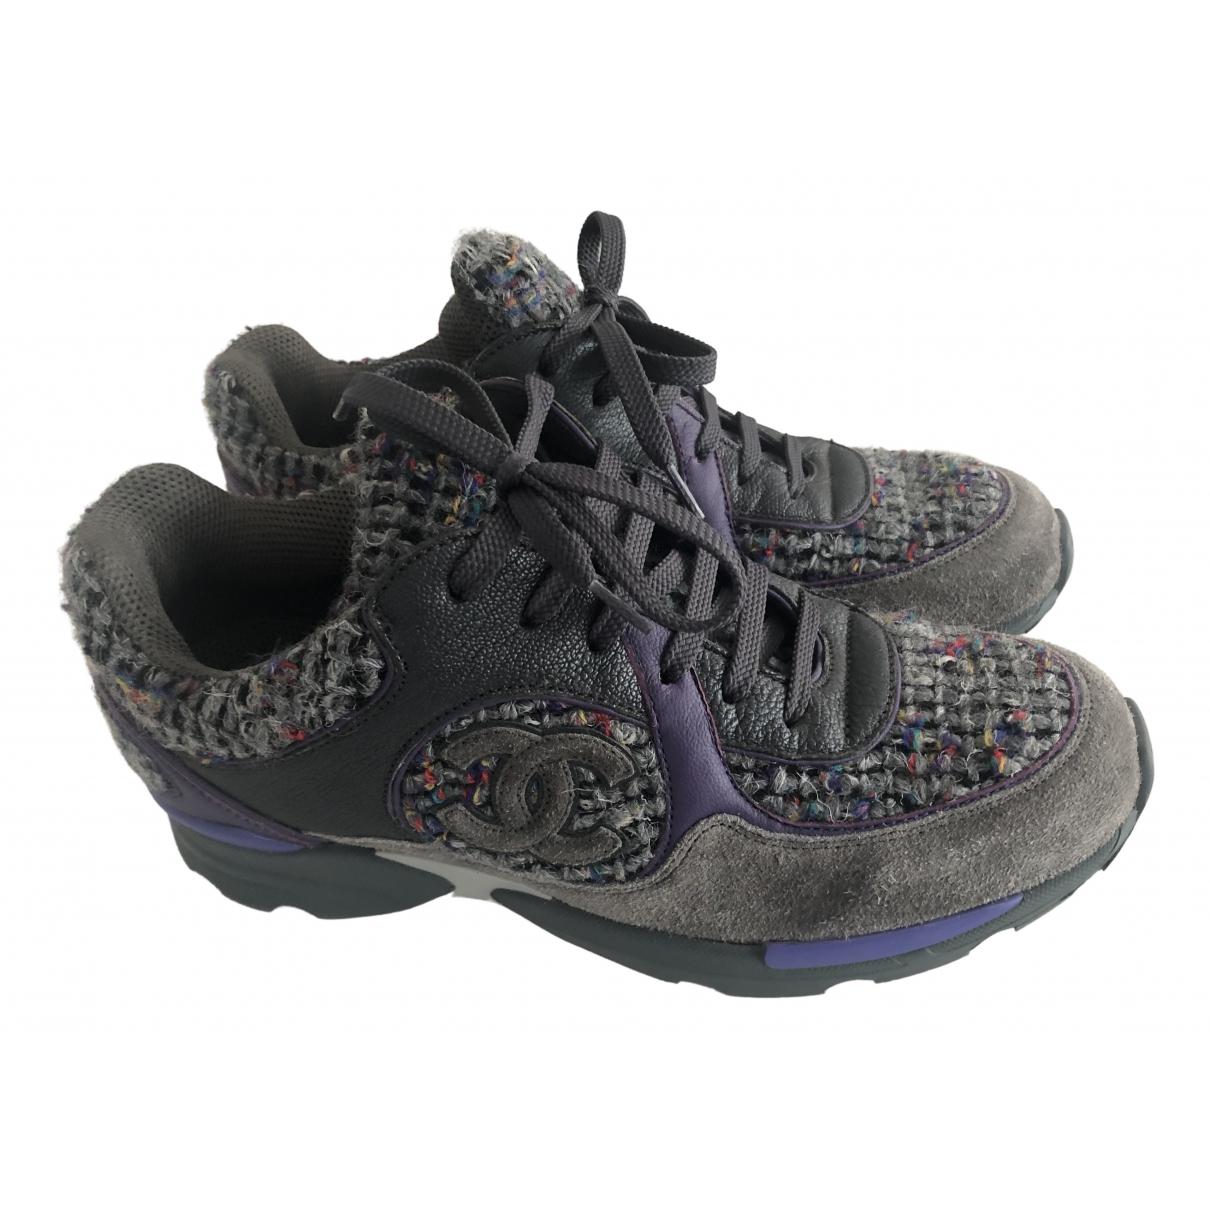 Chanel \N Sneakers in  Anthrazit Tweed